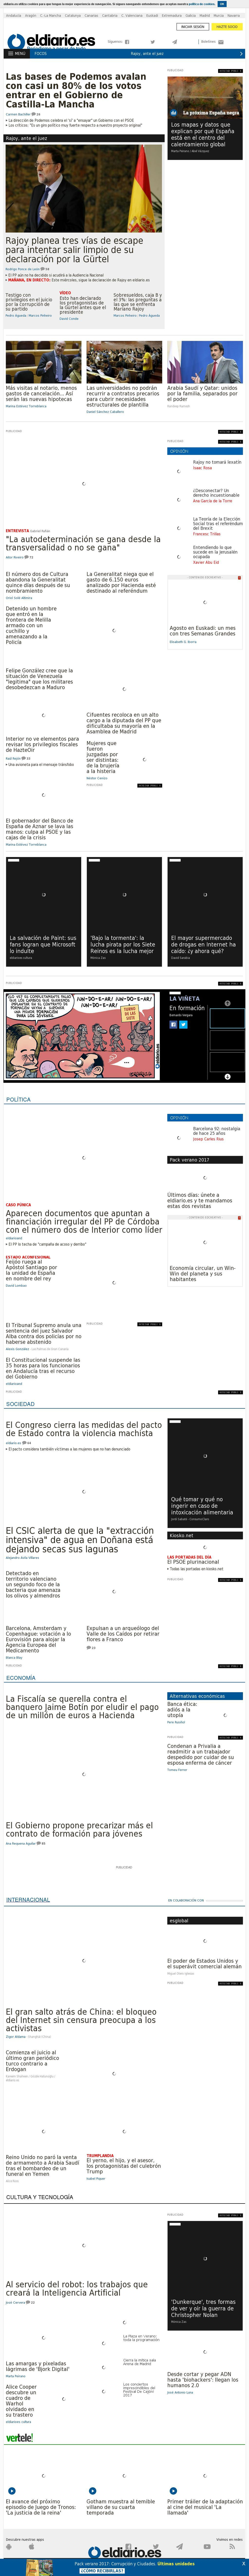 El Diario at Tuesday July 25, 2017, 12:04 p.m. UTC